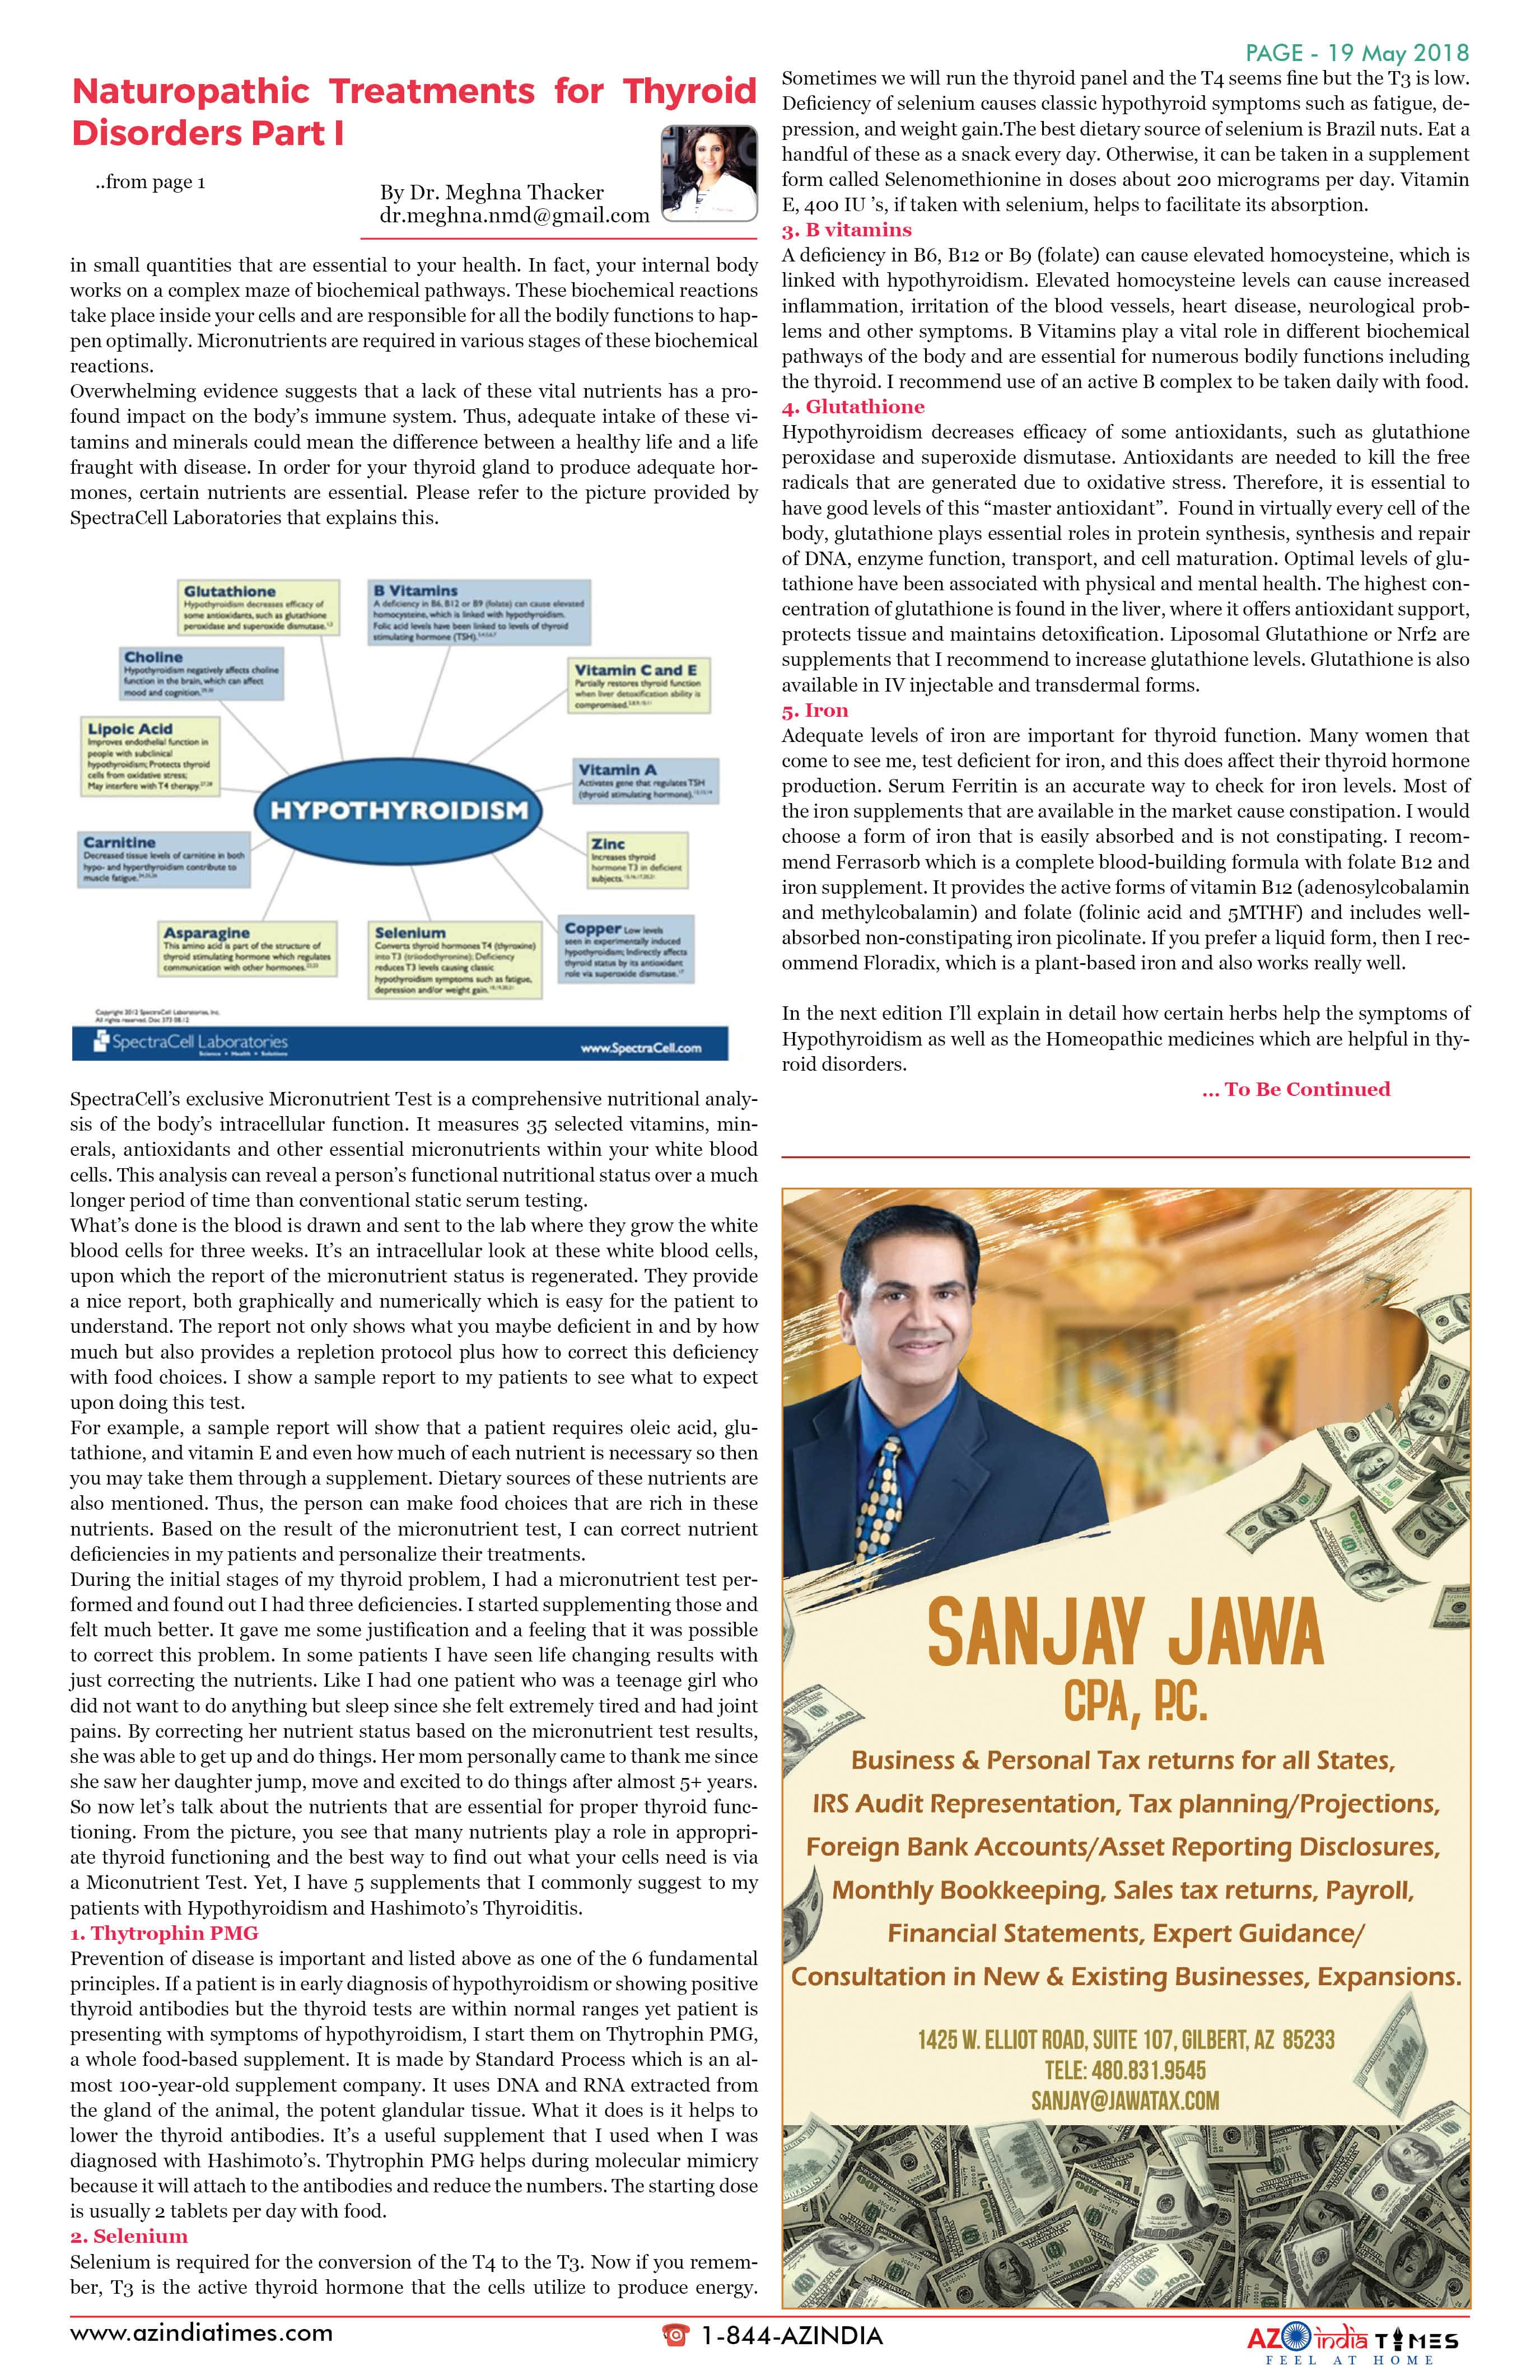 AZ INDIA MAY EDITION 19